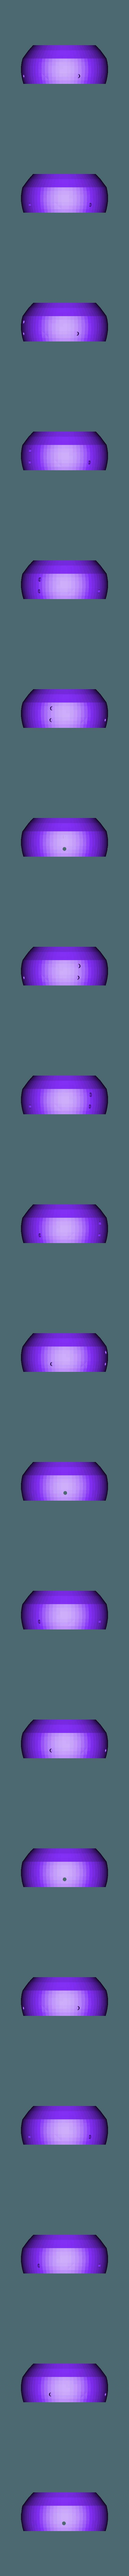 Eyeball_1.stl Download free STL file Animatronic eyes • 3D printer template, robolab19